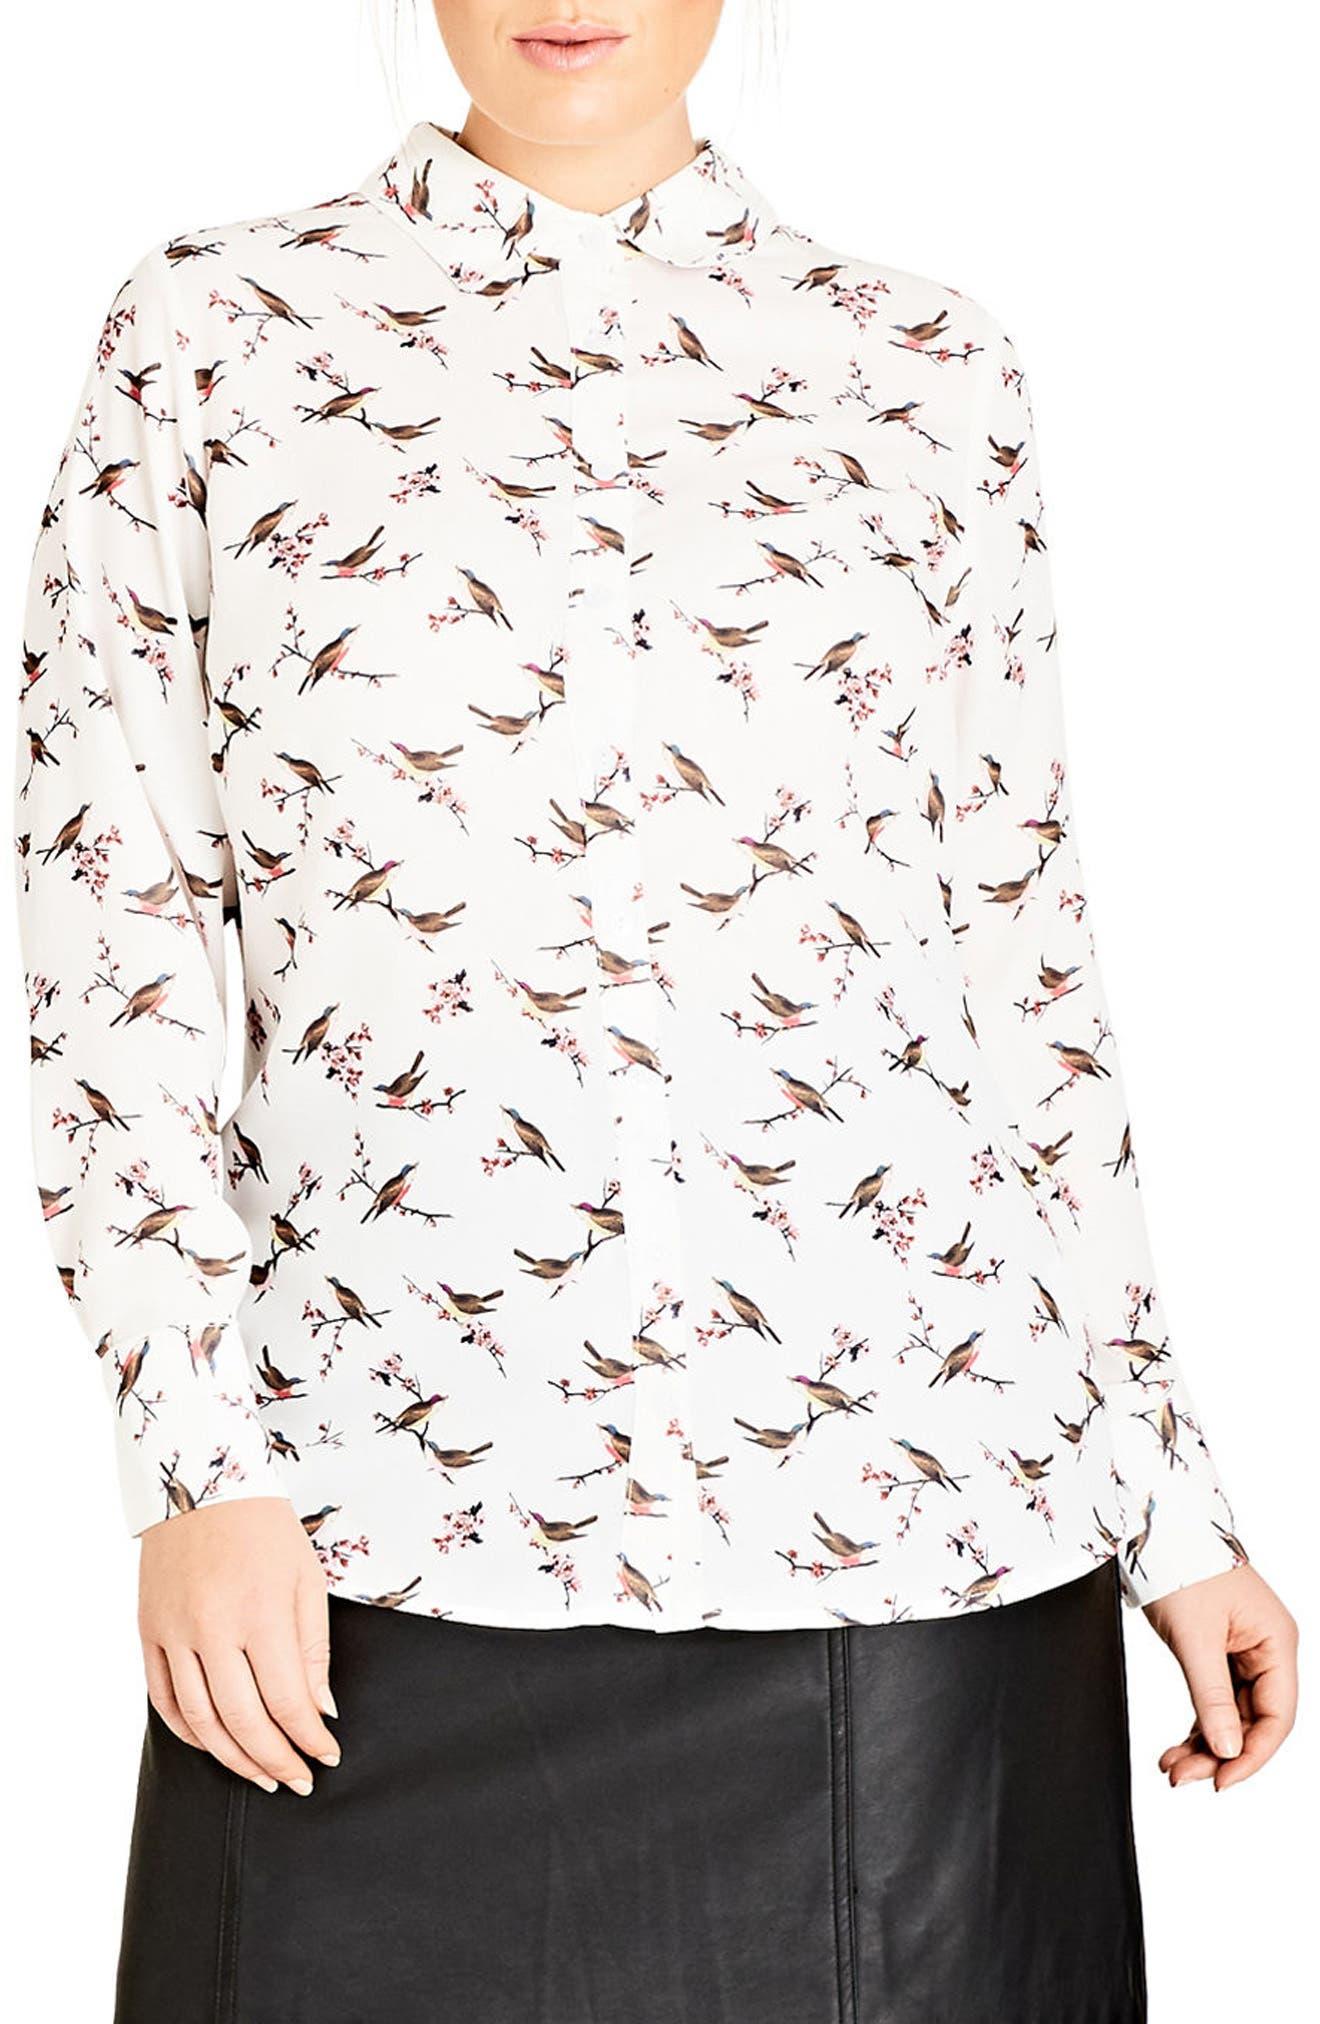 Main Image - City Chic Birdy Shirt (Plus Size)